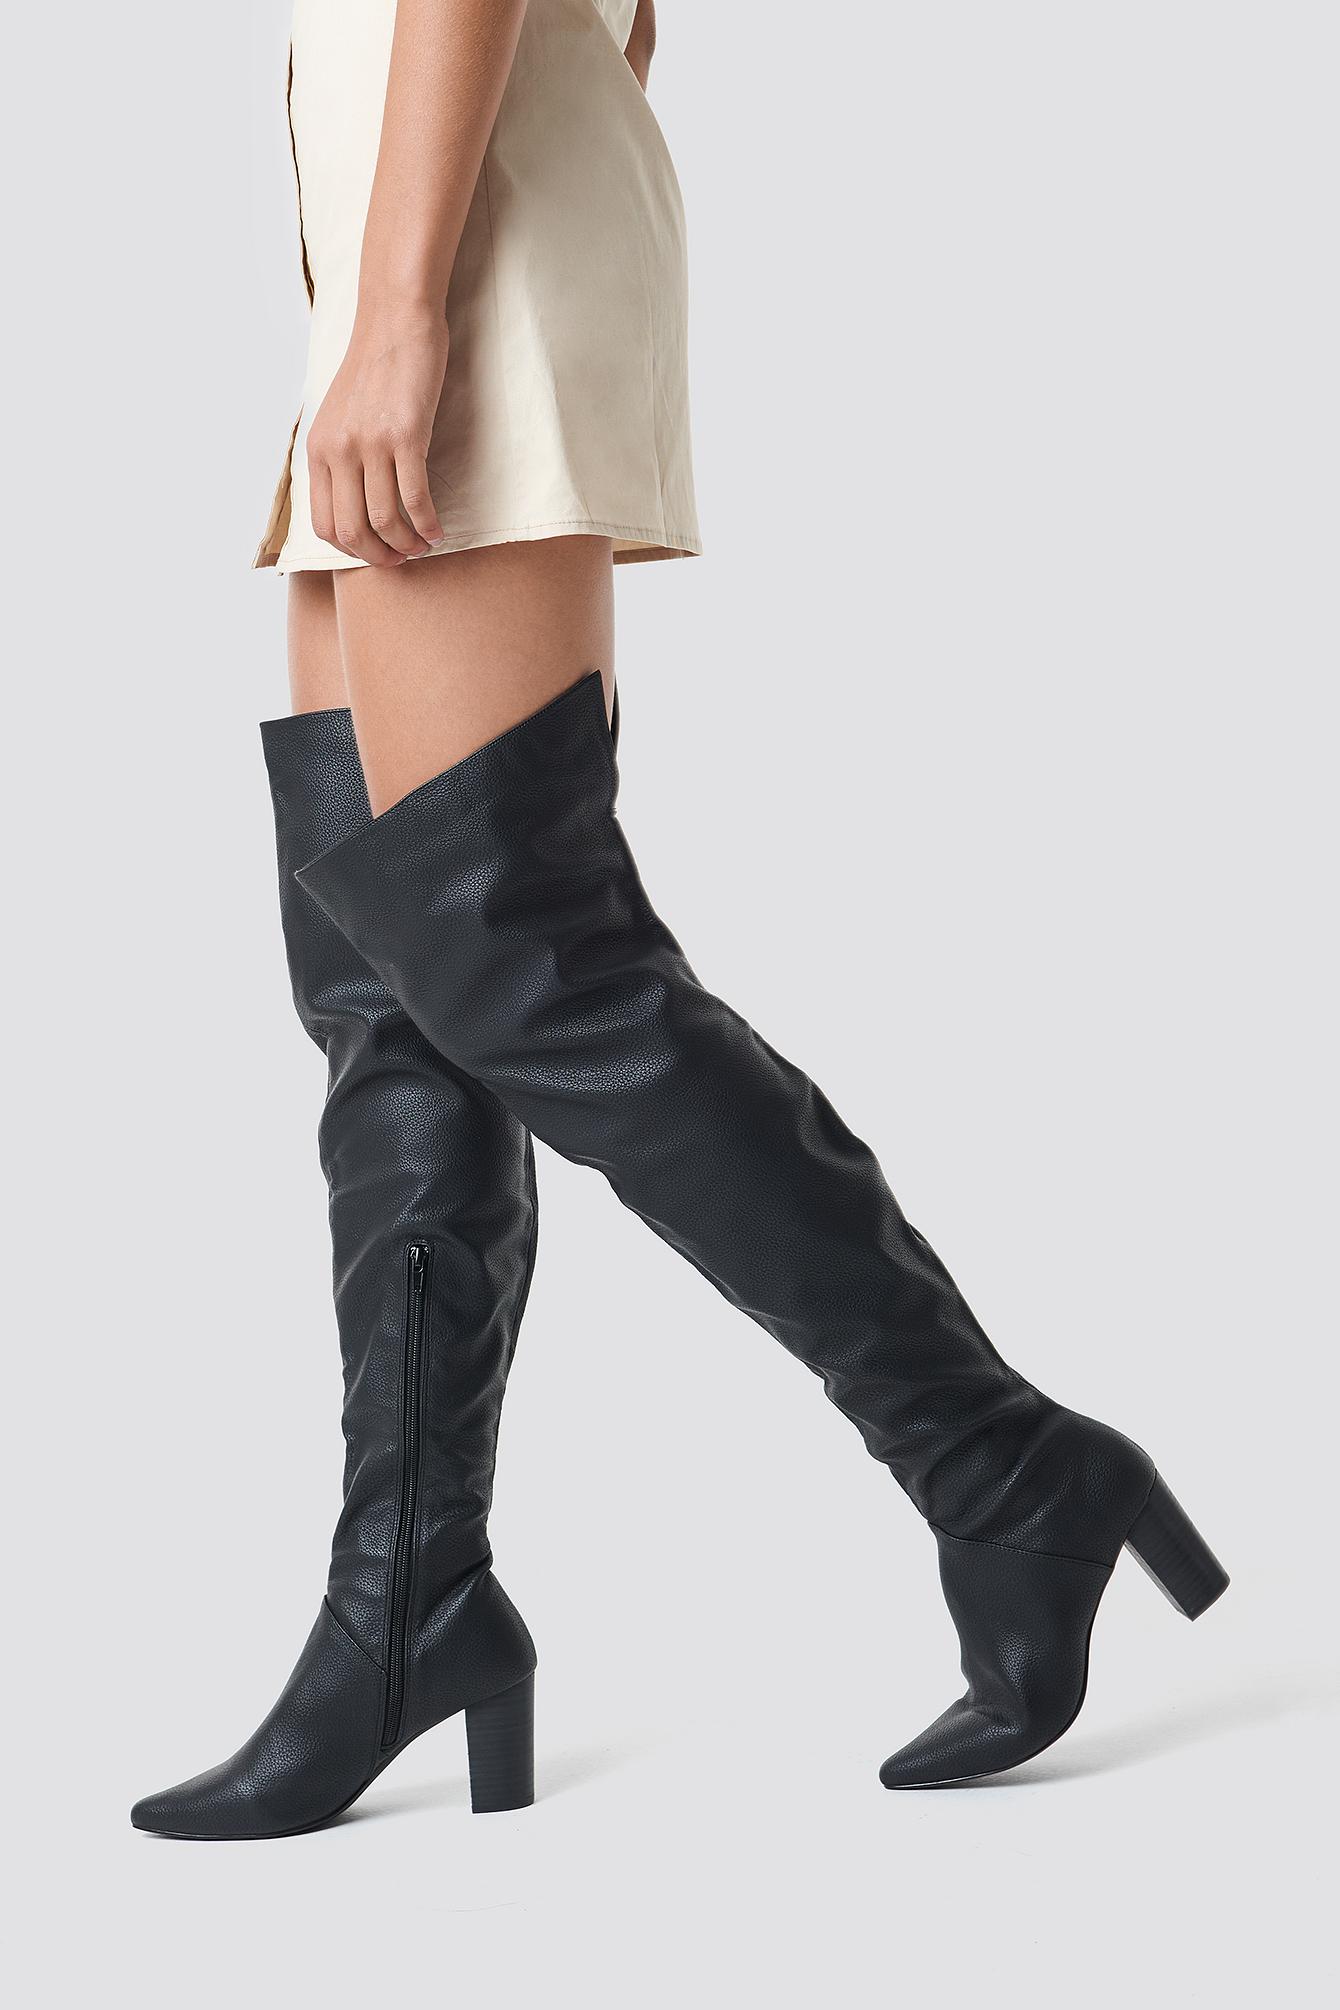 na-kd shoes -  Classic Overknee Boots - Black